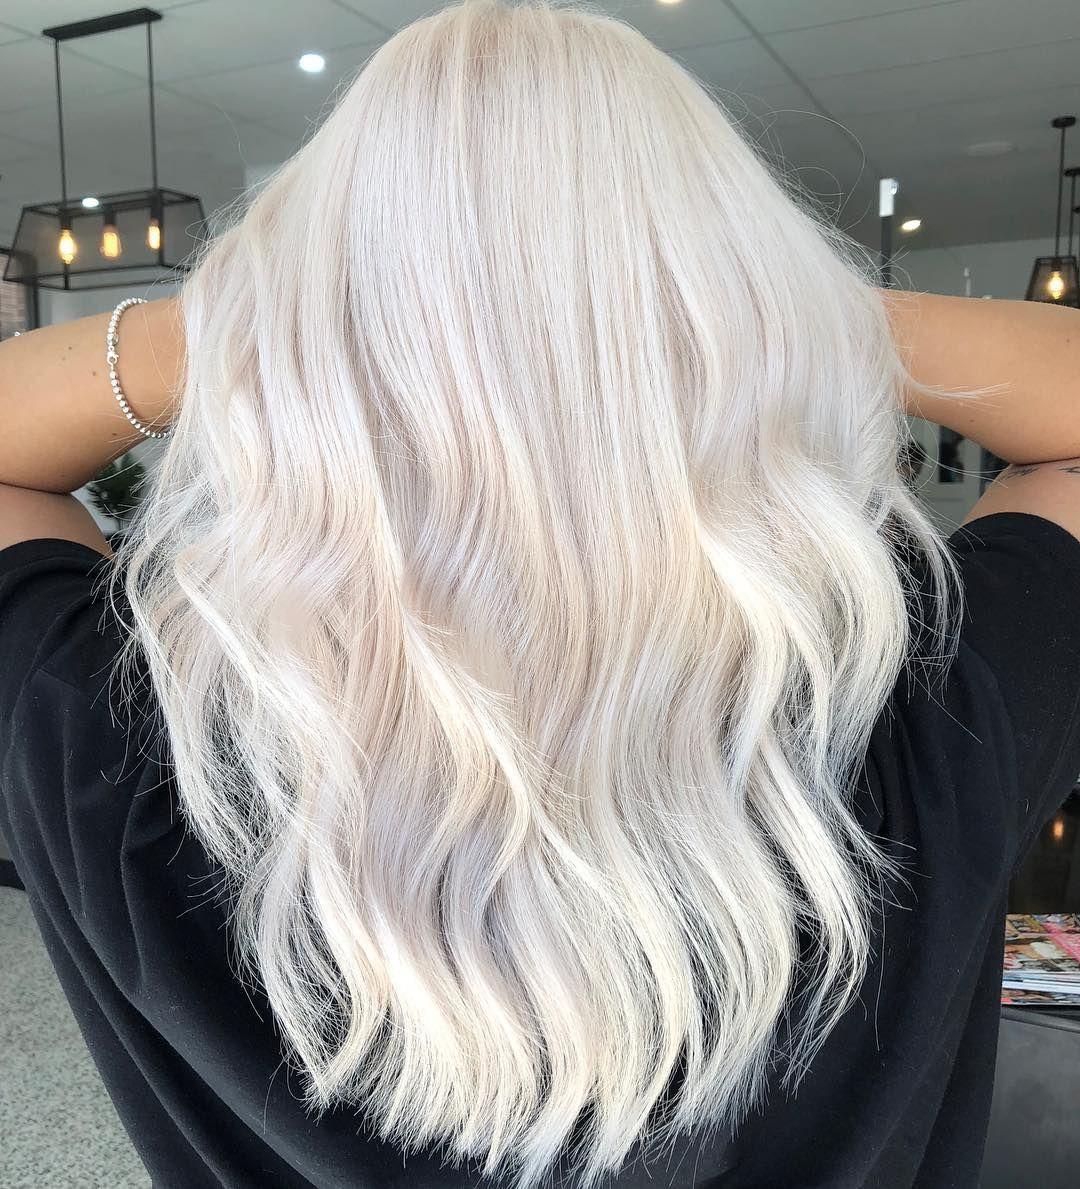 Hairbytashalouisec On Instagram Snow White Hairbytashc Hair